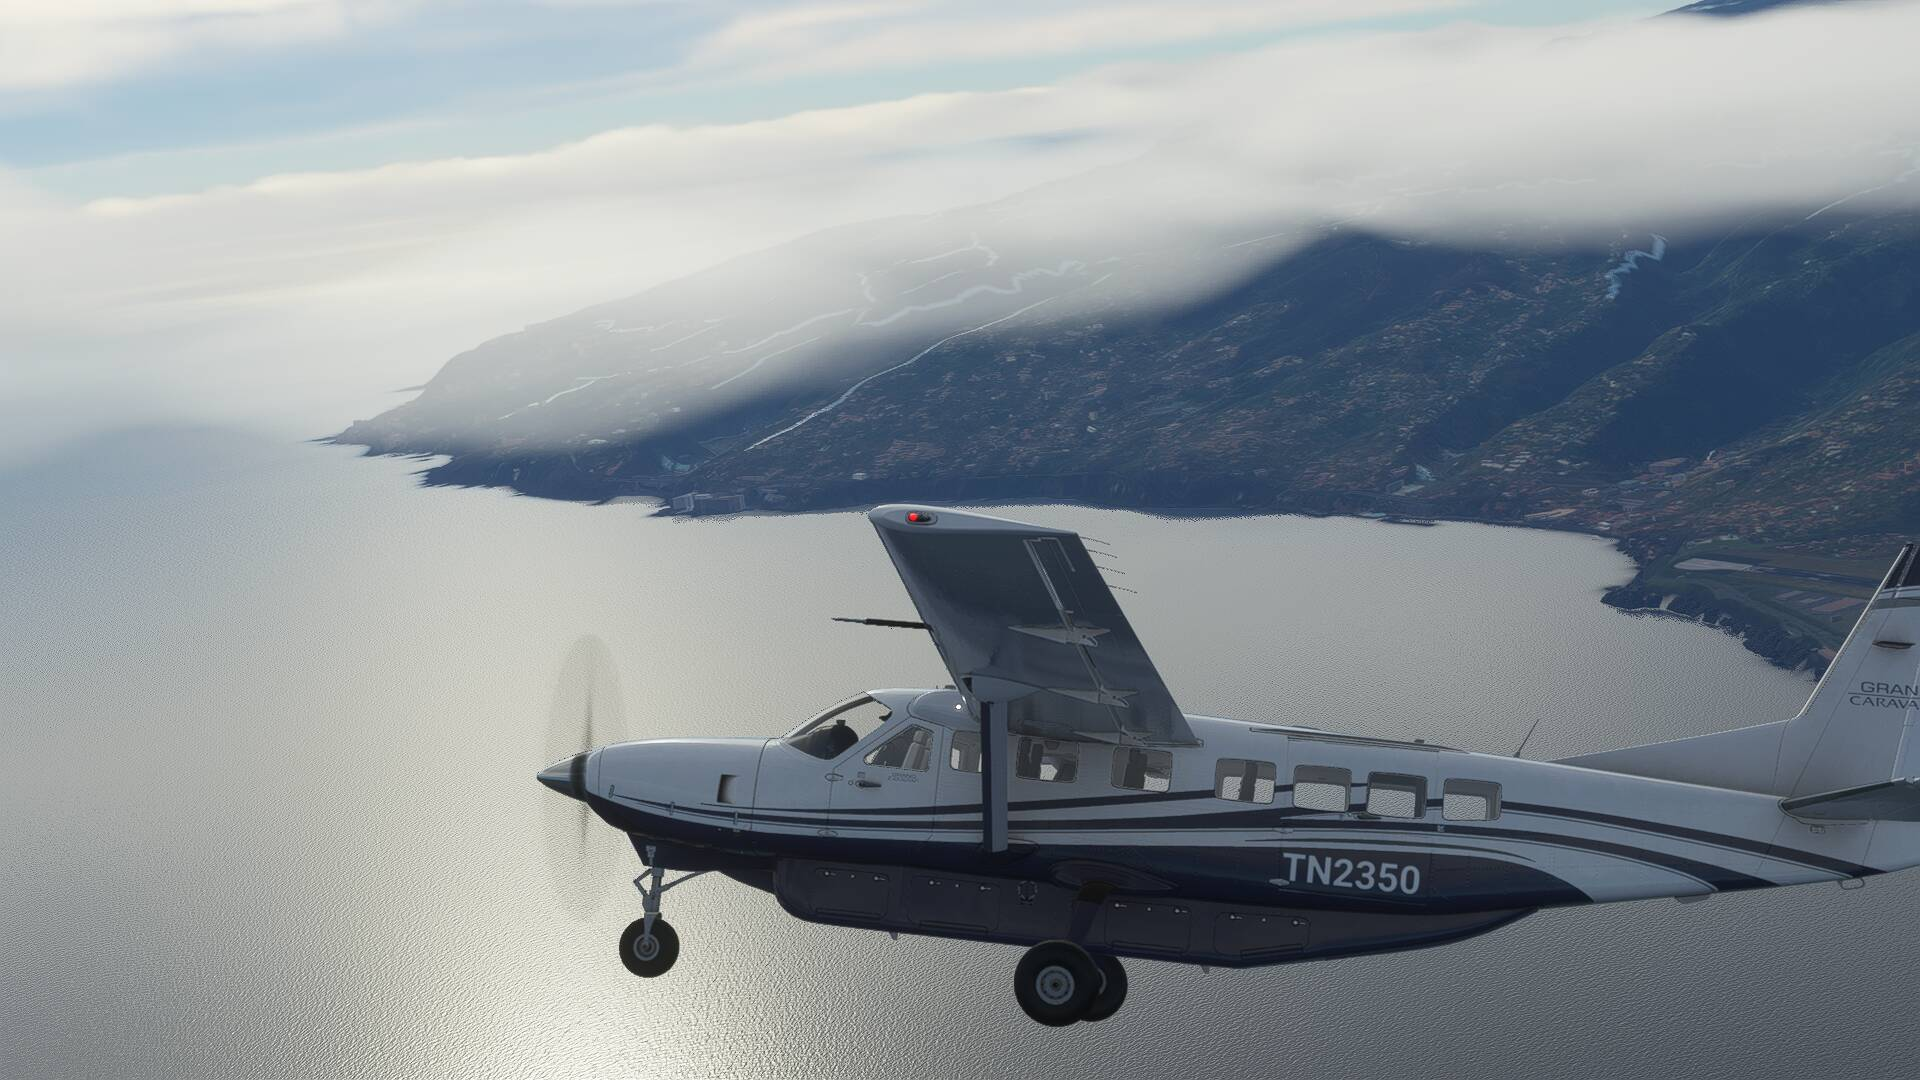 Madeira Island - Scenery - Microsoft Flight Simulator Forums